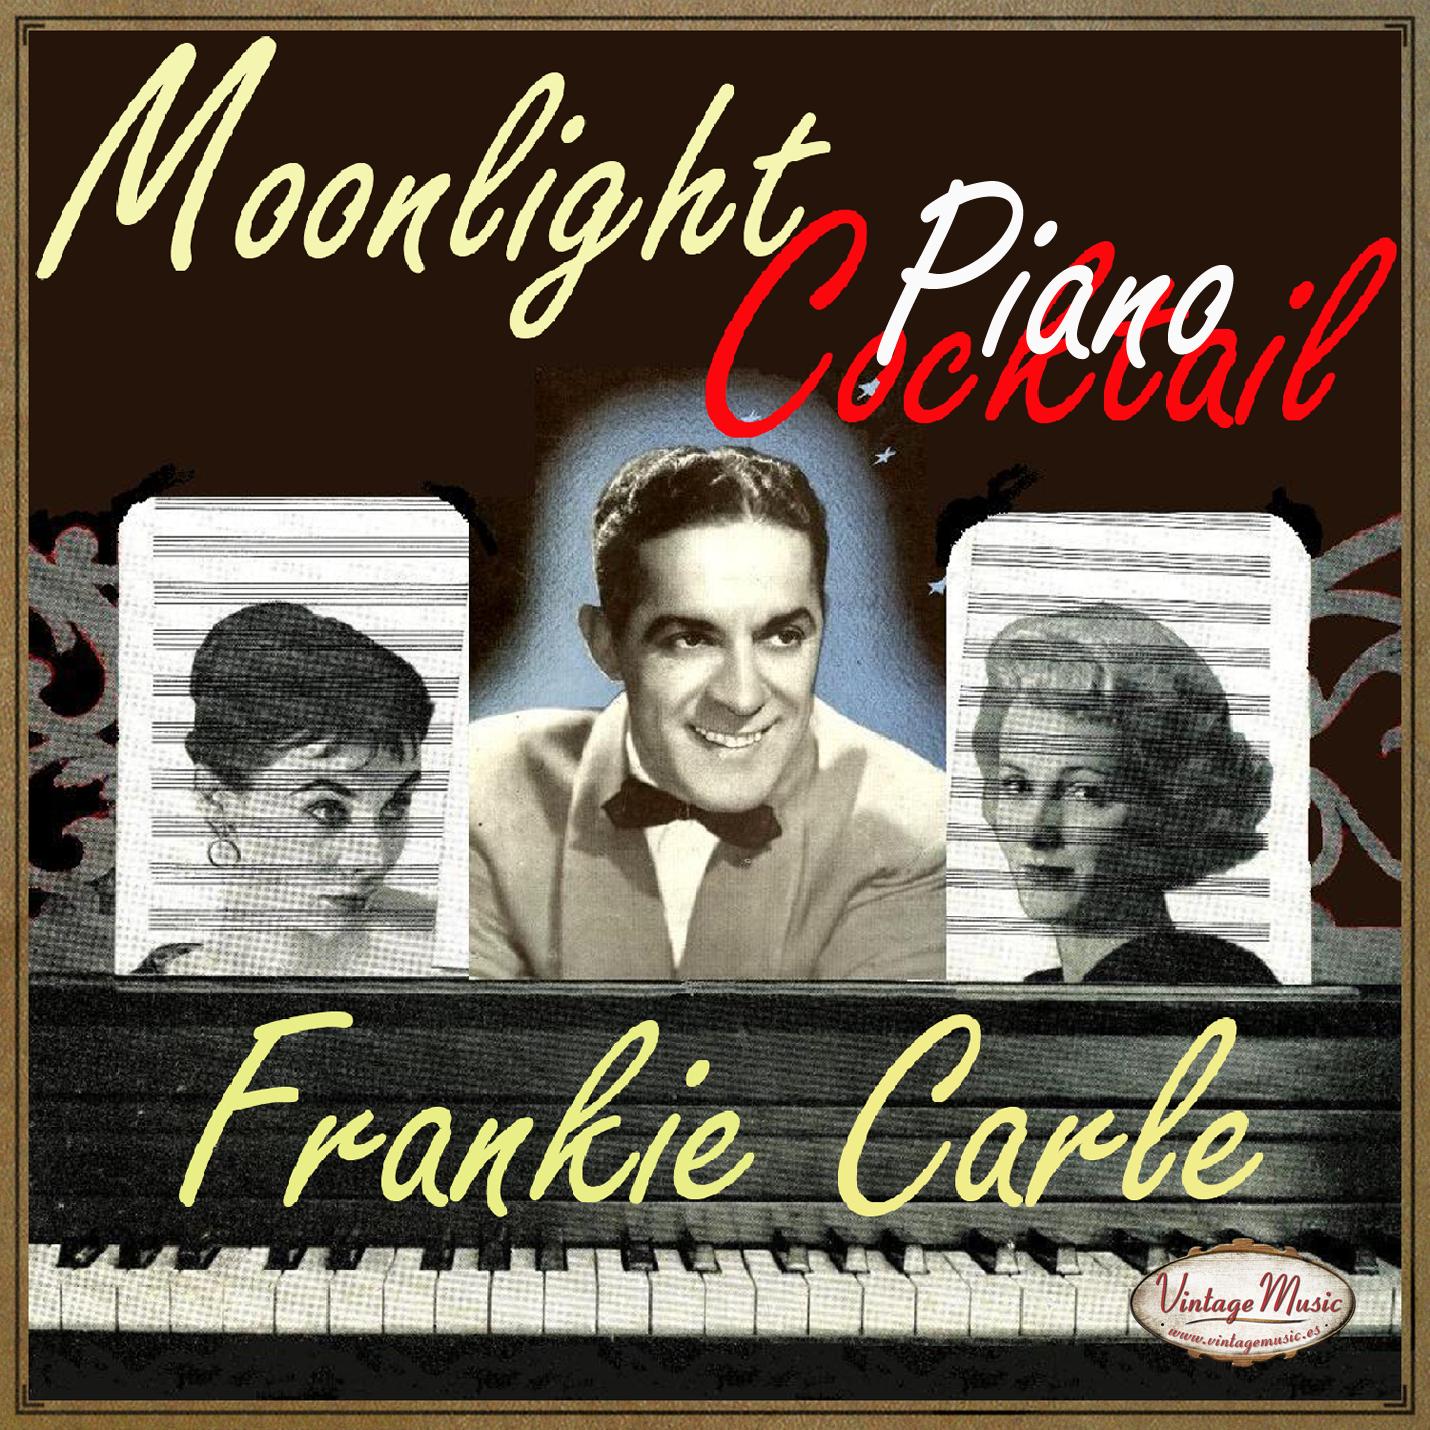 Frankie Carle - FRANKIE CARLE CD Vintage Jazz Swing. Moonlight Piano Cocktail , Blue Moon - CD